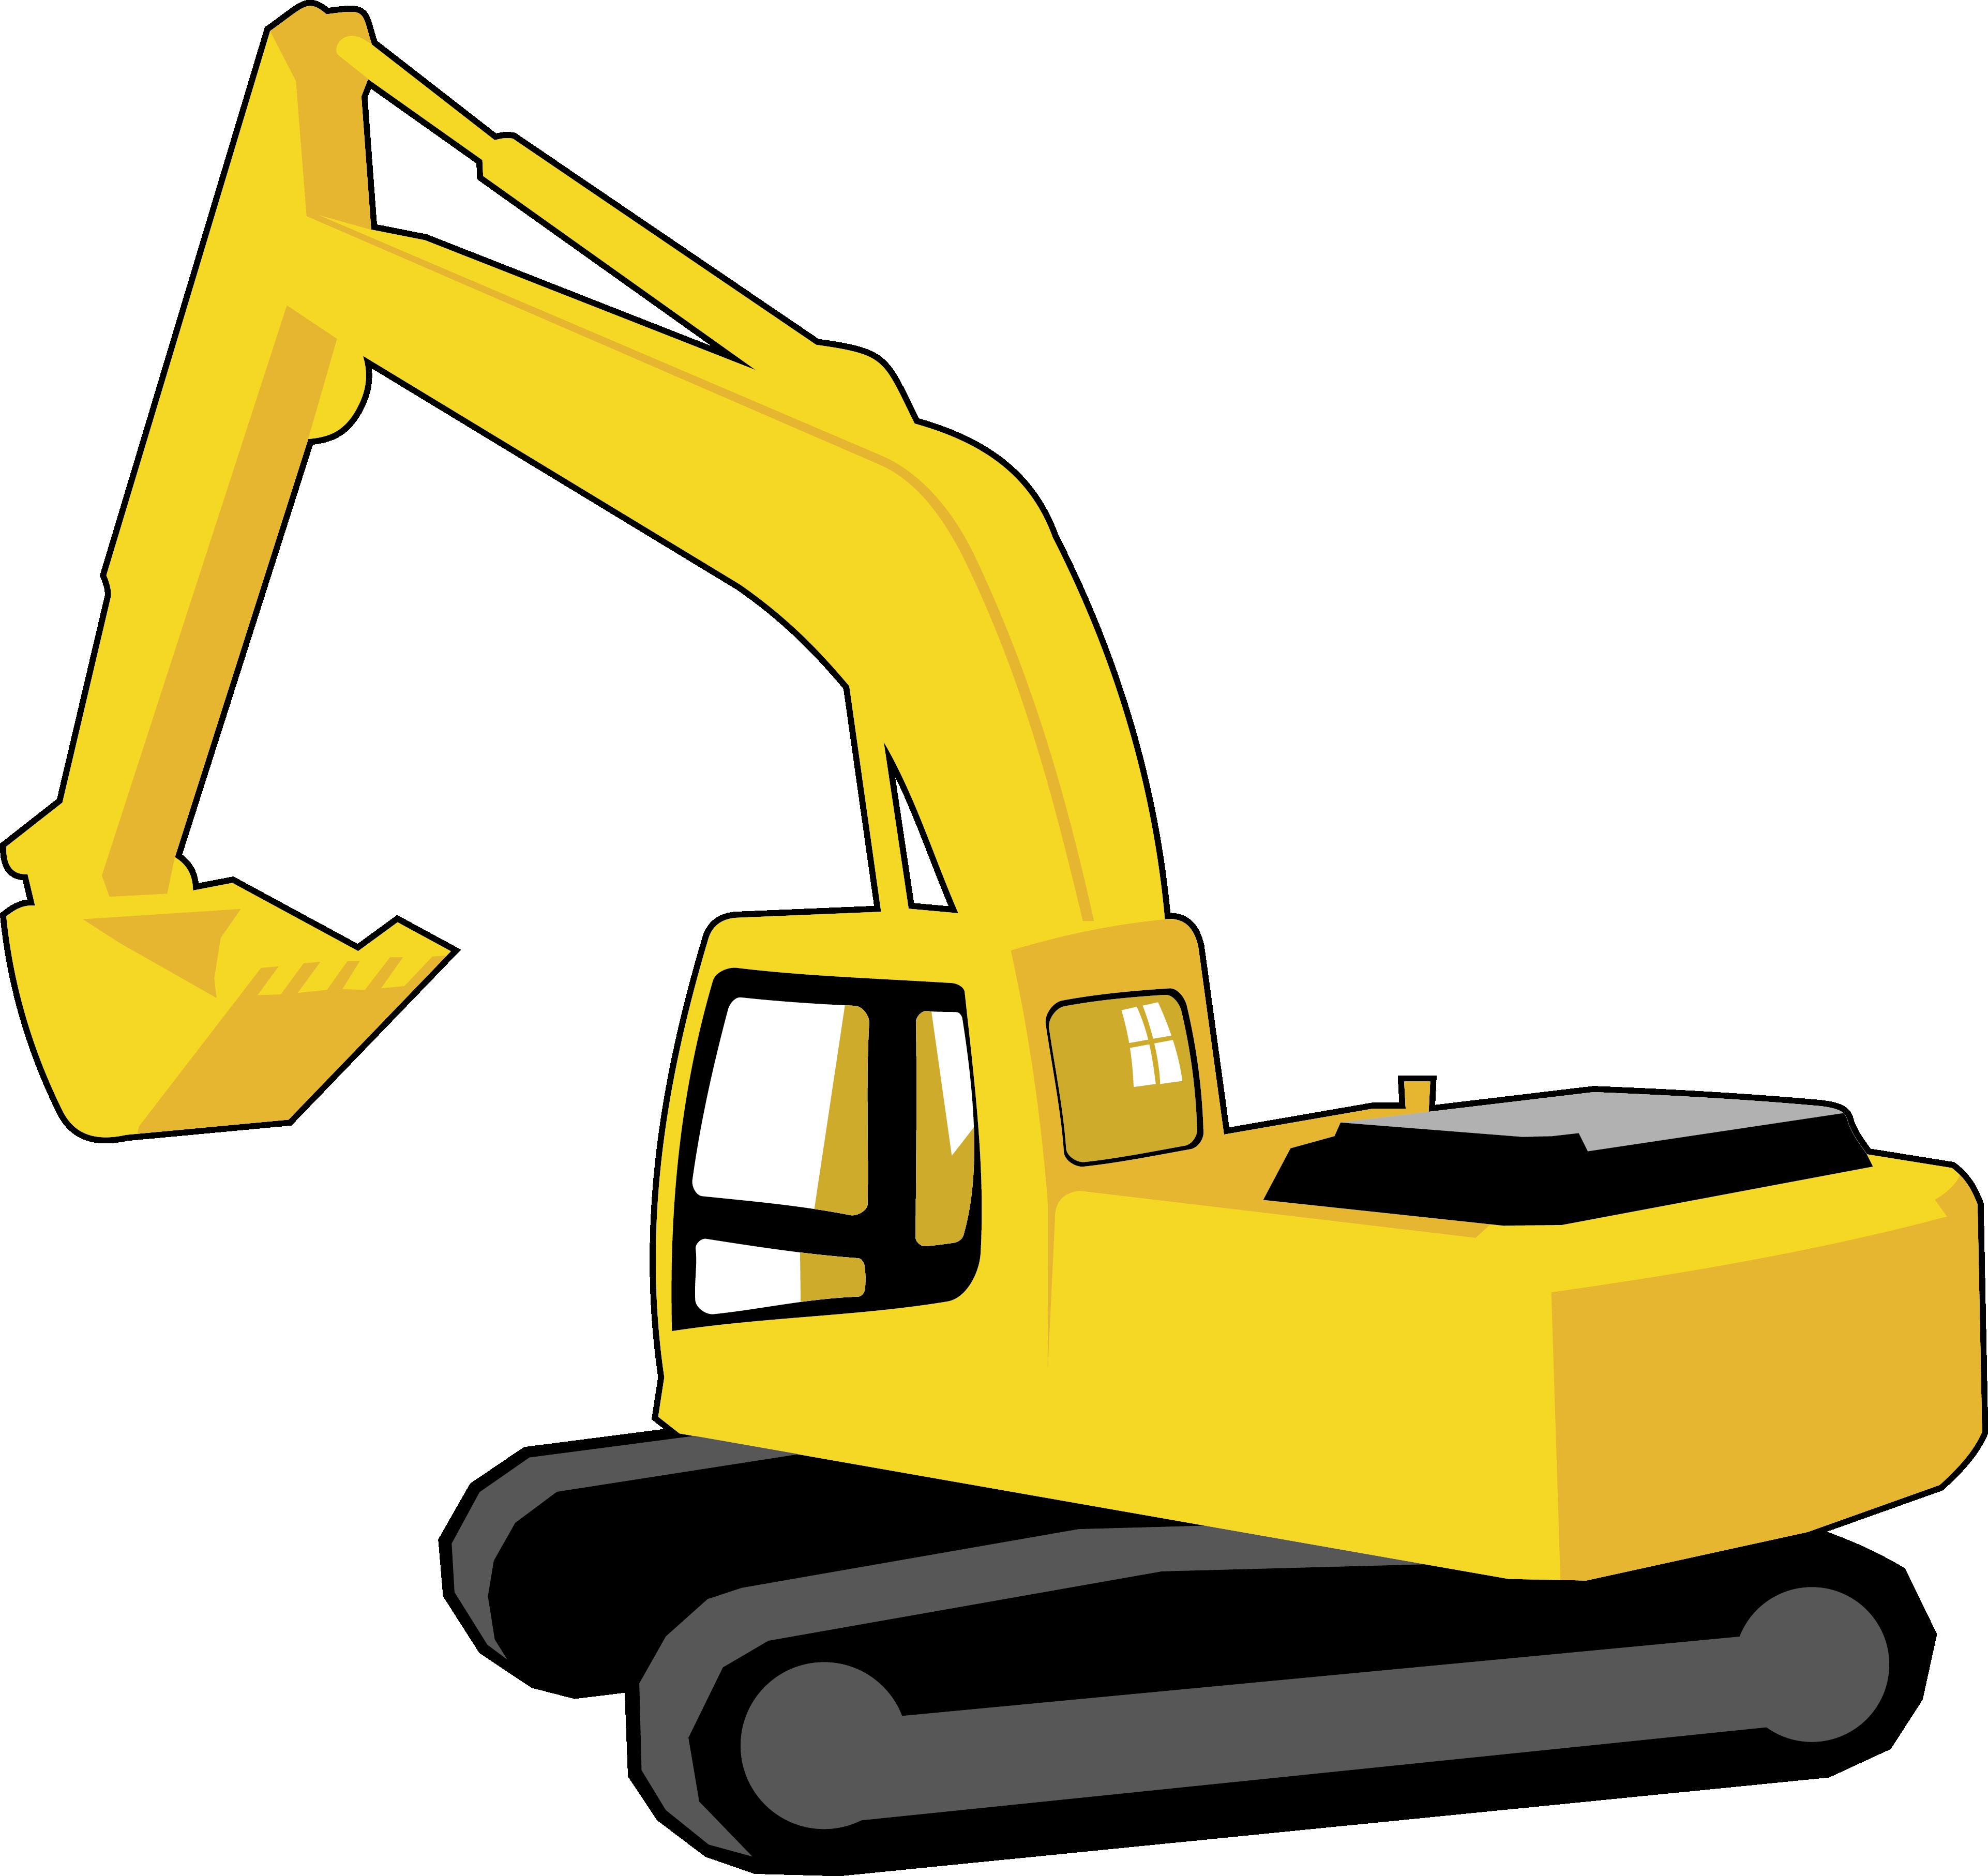 Bulldozer at getdrawings com. Excavator clipart sketch